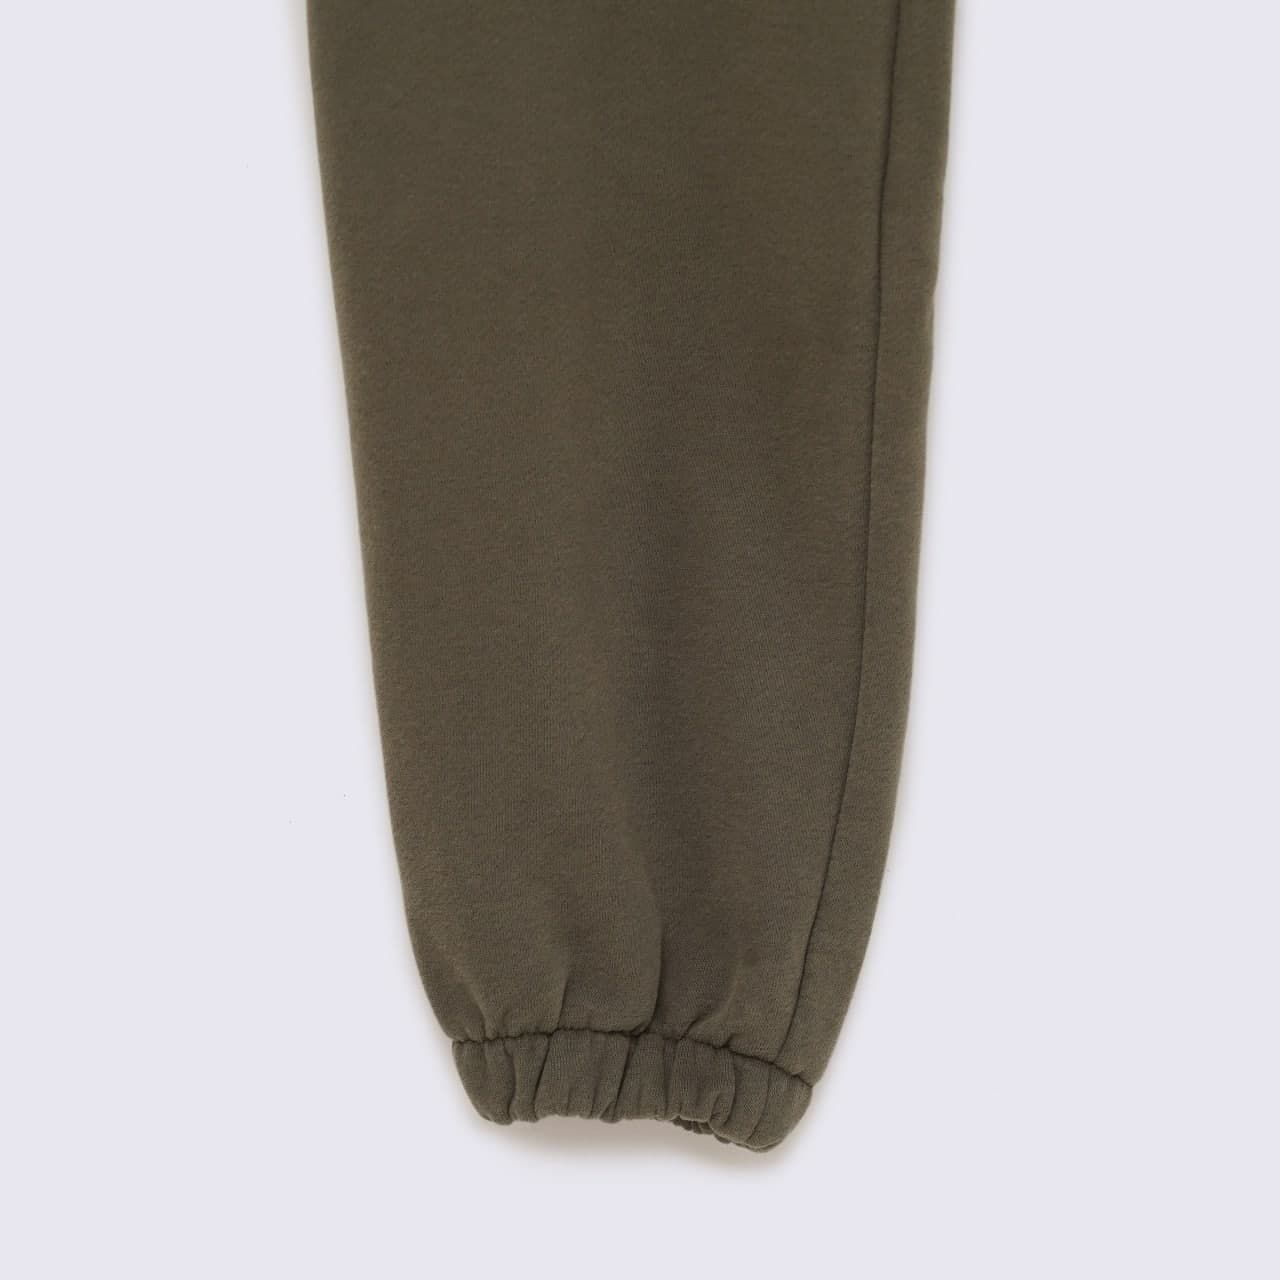 Спортивные штаны South basik khaki - фото 4